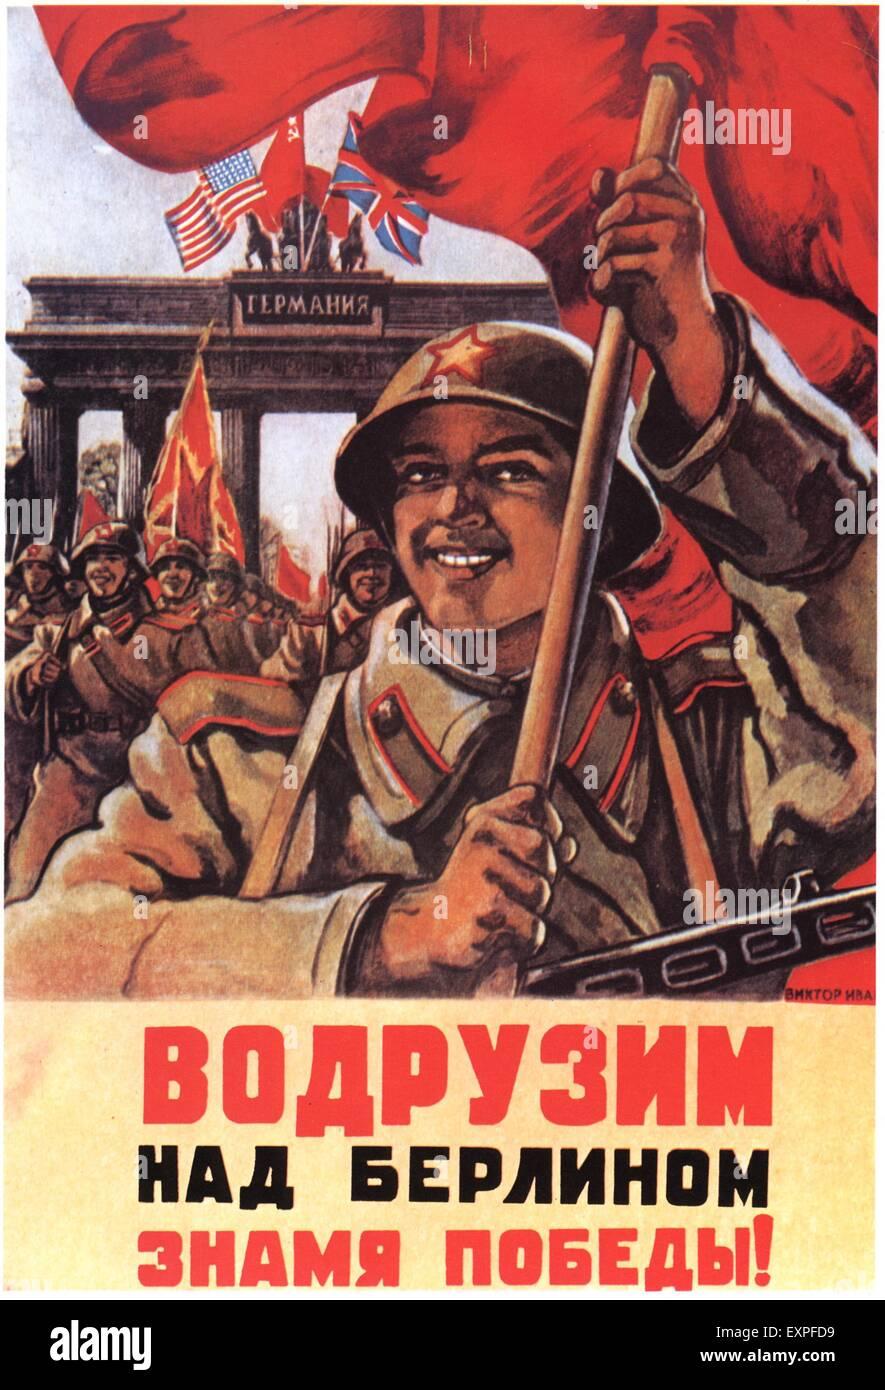 1940s Russia Soviet Union Propaganda Poster Stock Photo ...